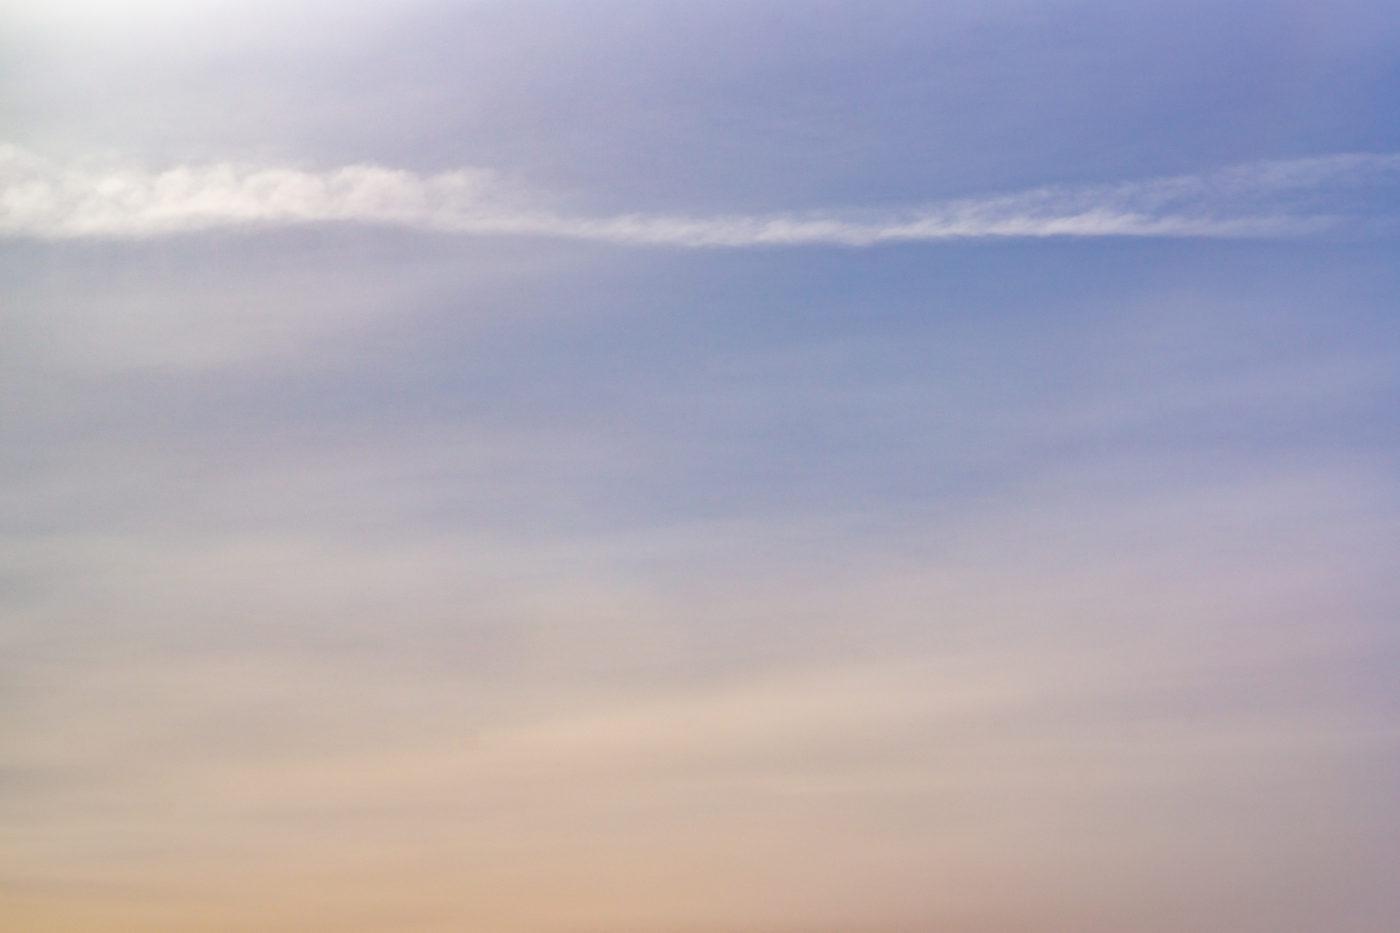 A blue and orange sky with soft misty cloud streaks.